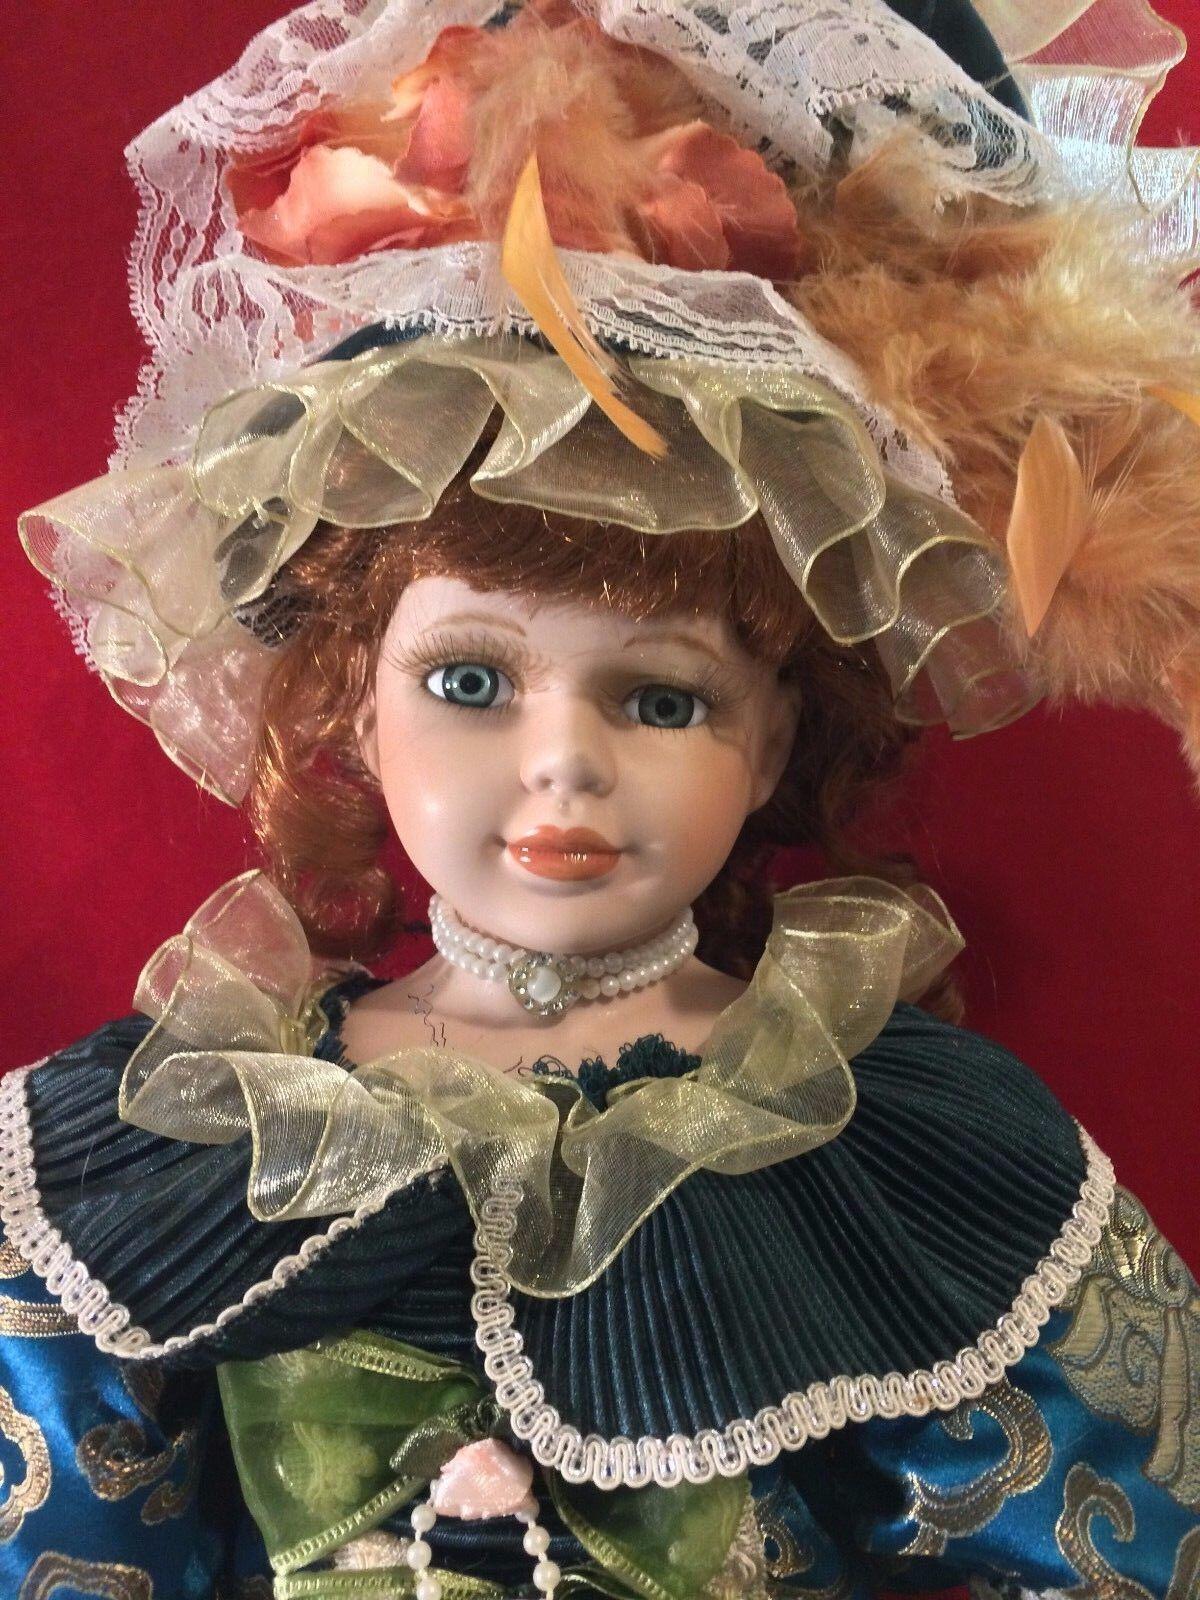 27  Beautiful Victorian Porcelain Doll Curly braun Hair 747 3600